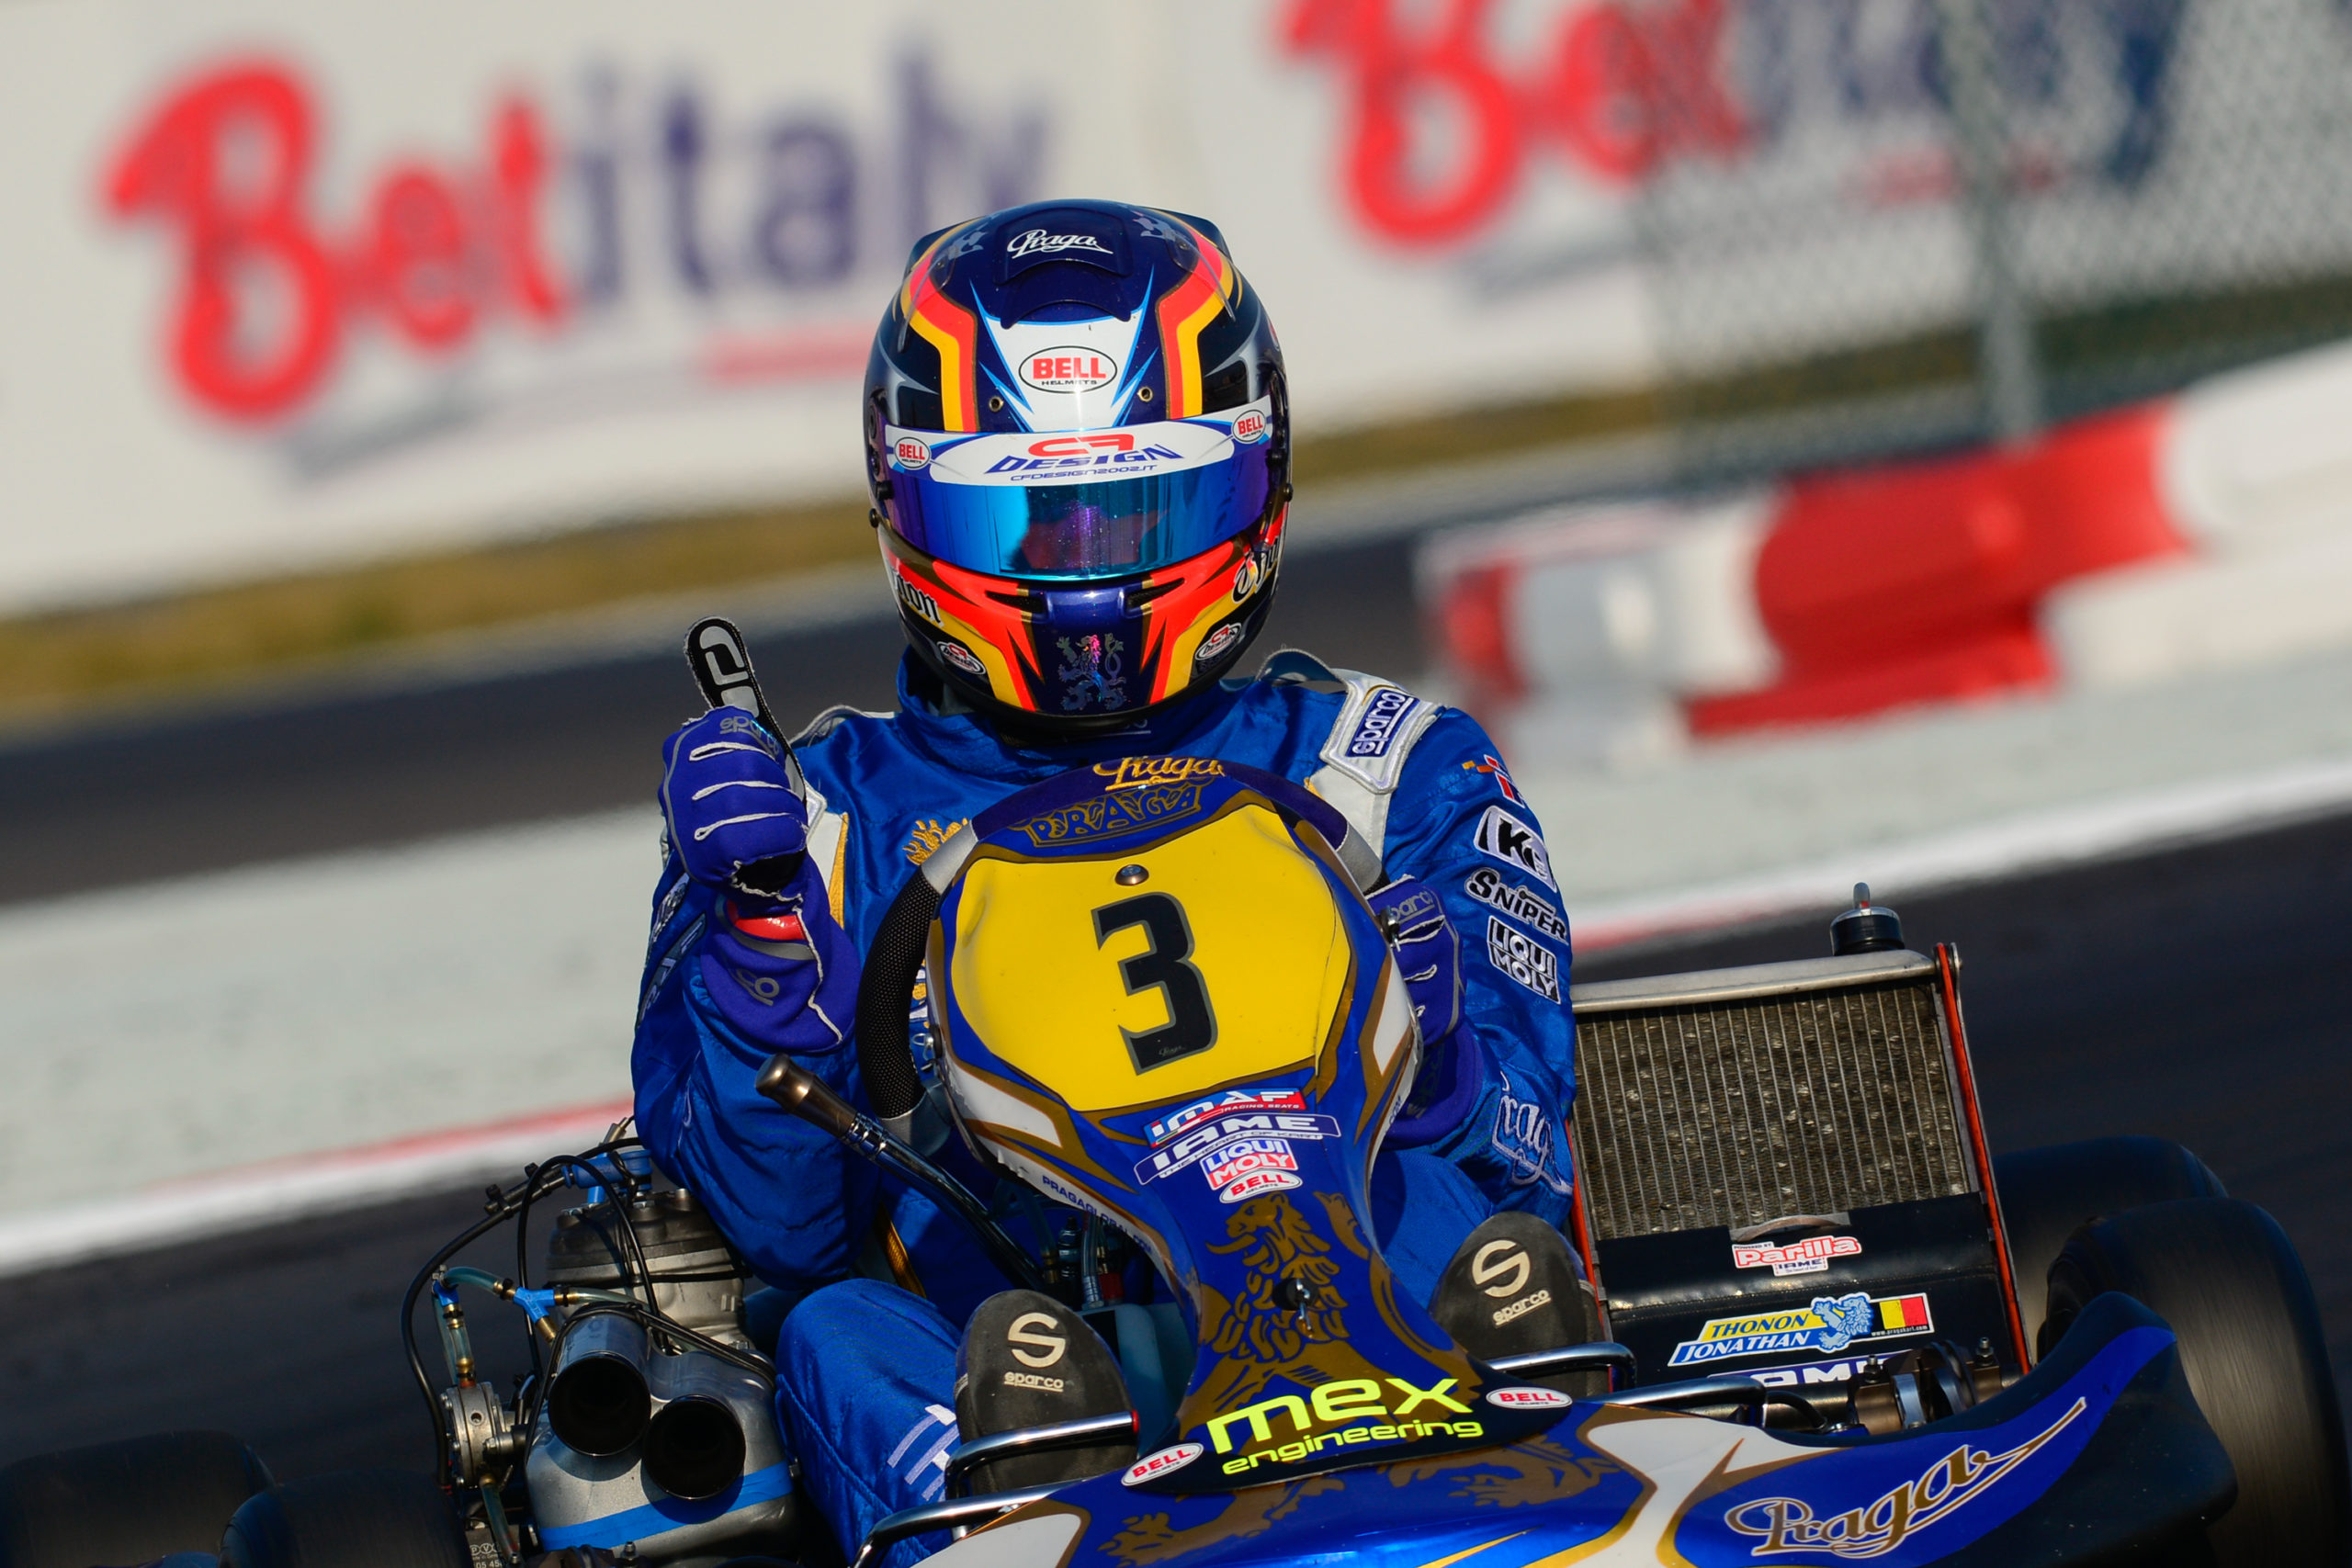 Praga factory team started the season with the podium finish